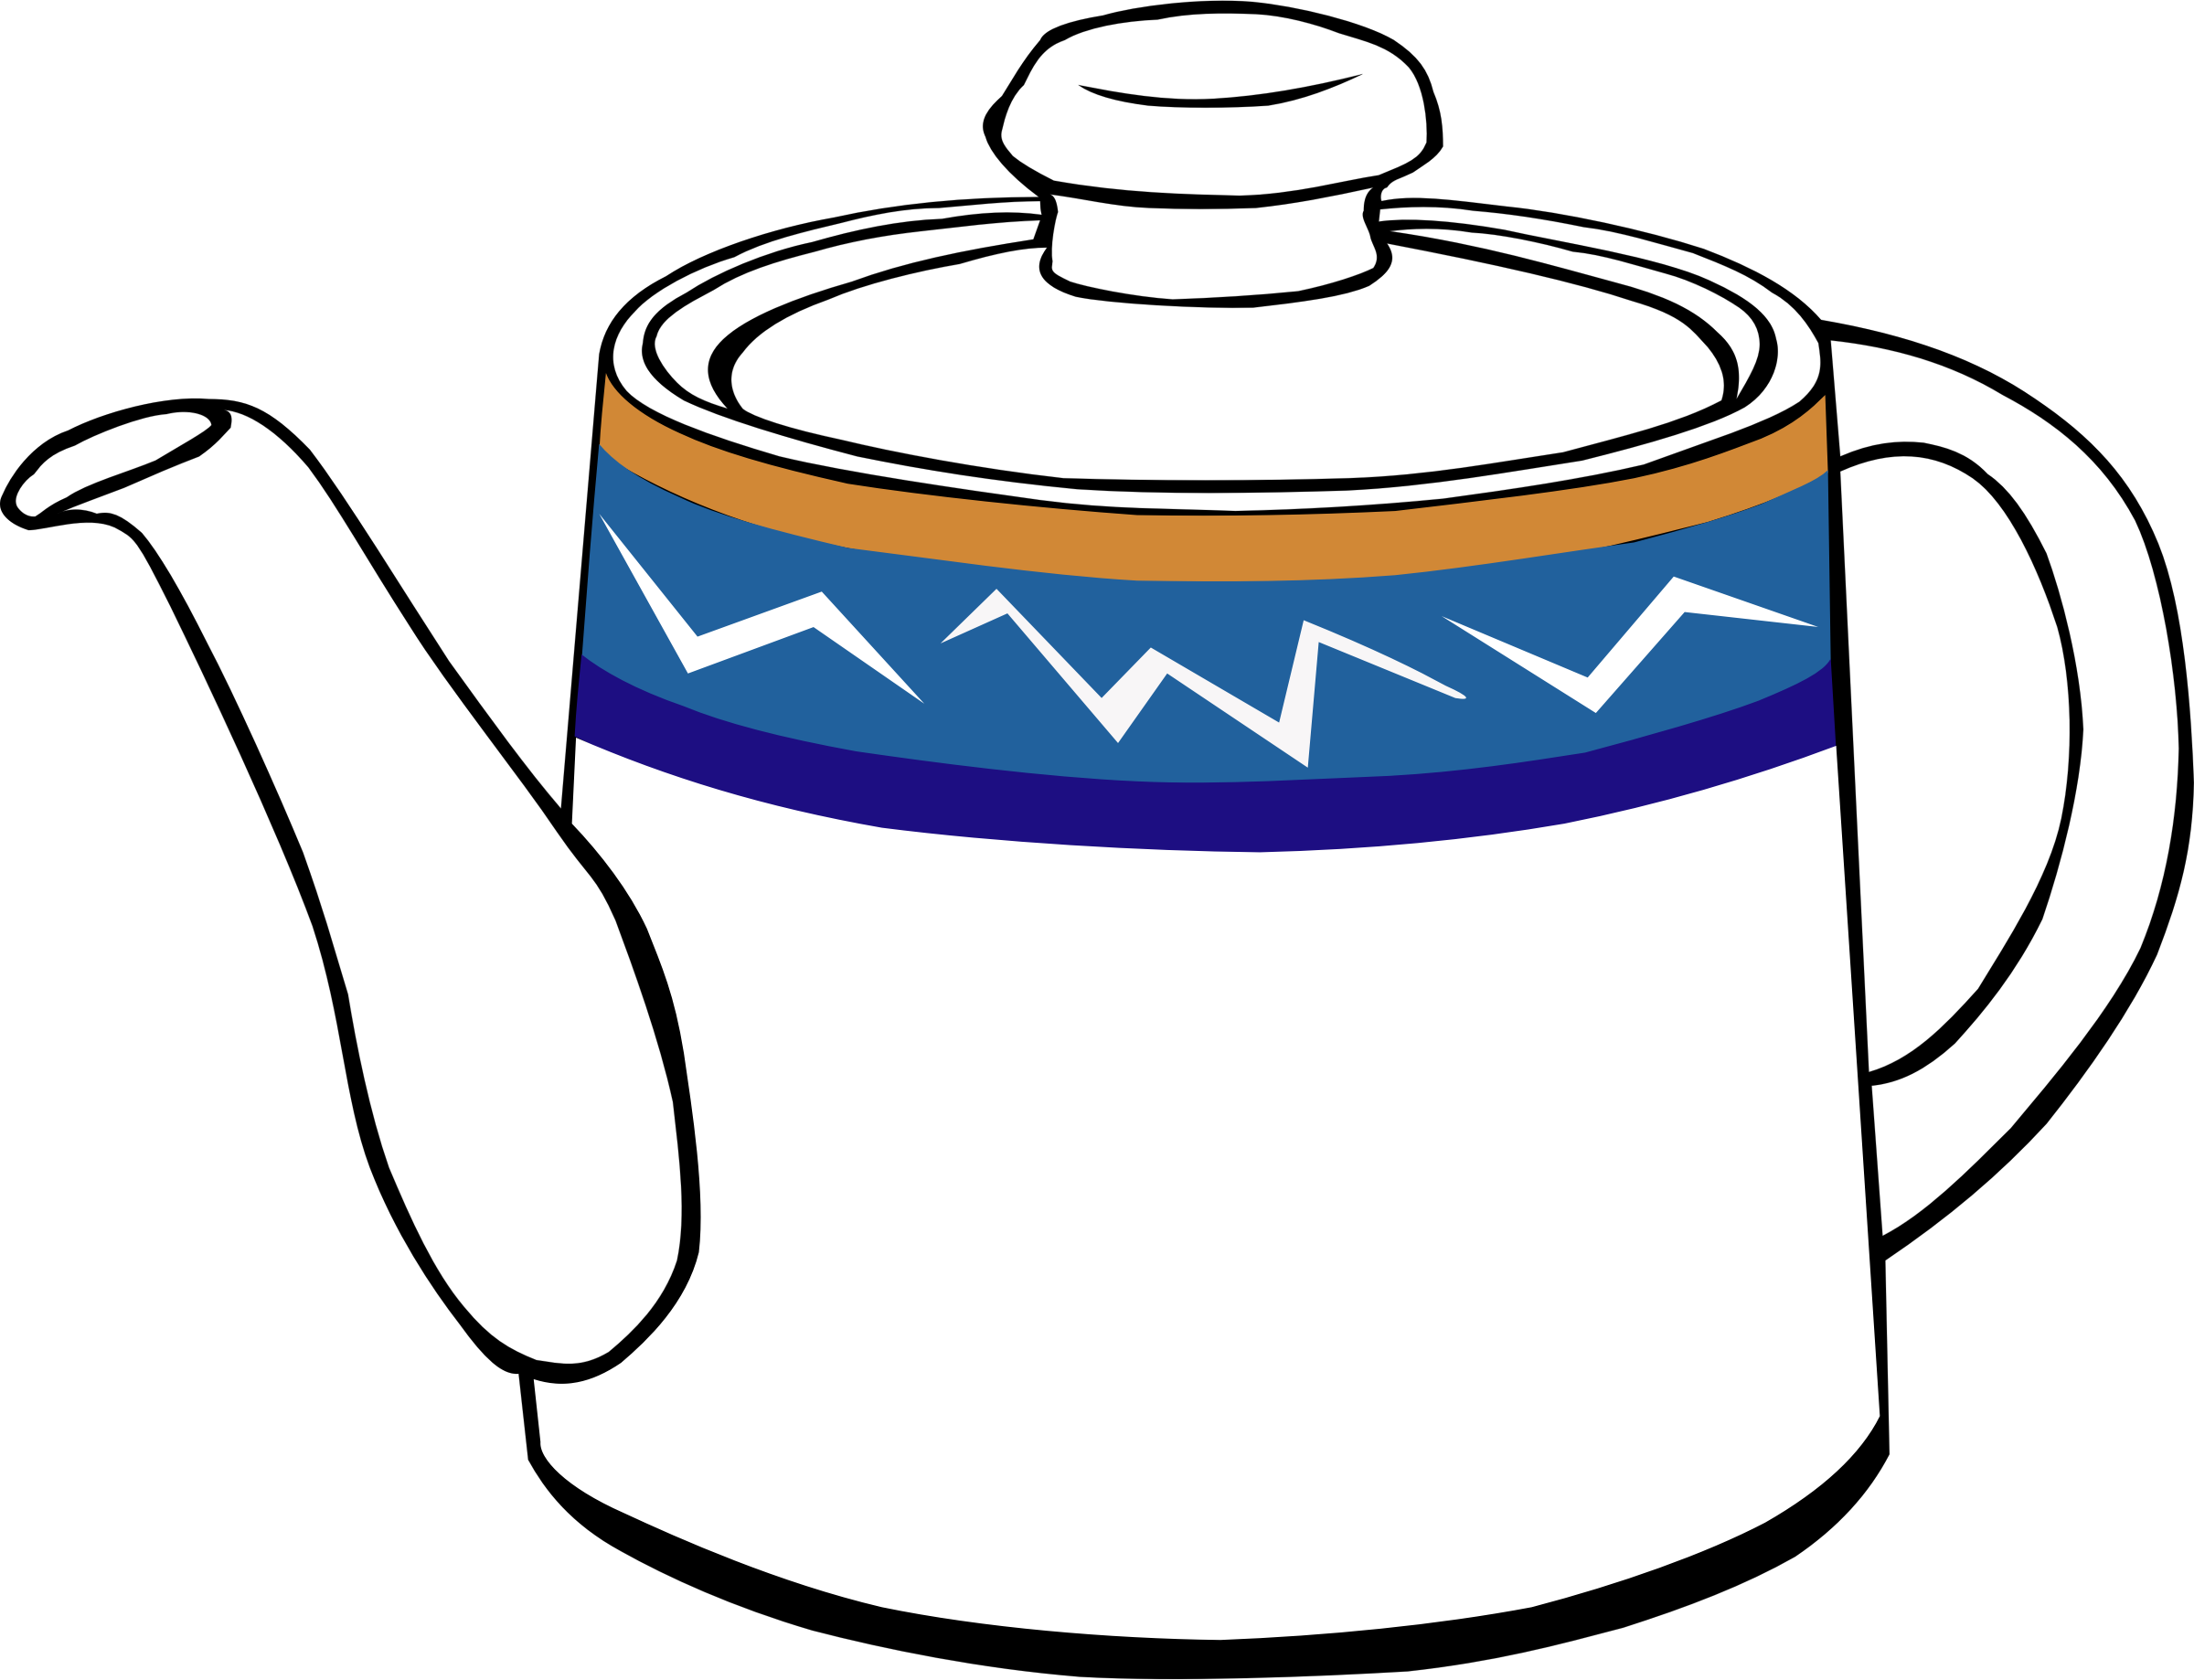 Fast food tea pot. Drinks clipart outline